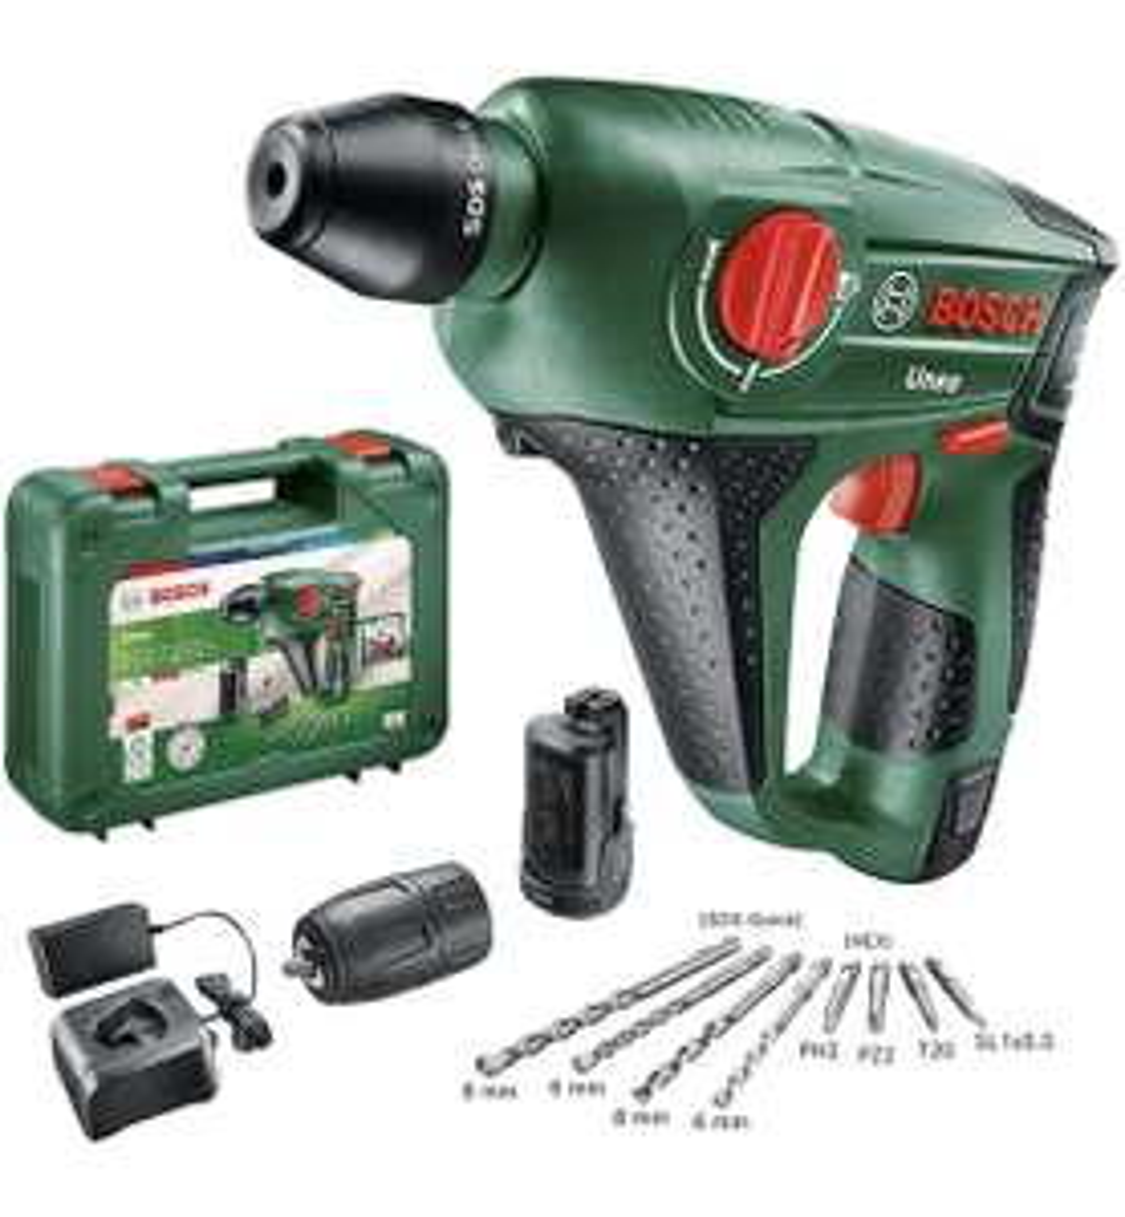 Bosch Akku Bohrhammer Uneo (2 Akku, 12 Volt System, max. Bohrerdurchmesser Beton 10mm, im Koffer)